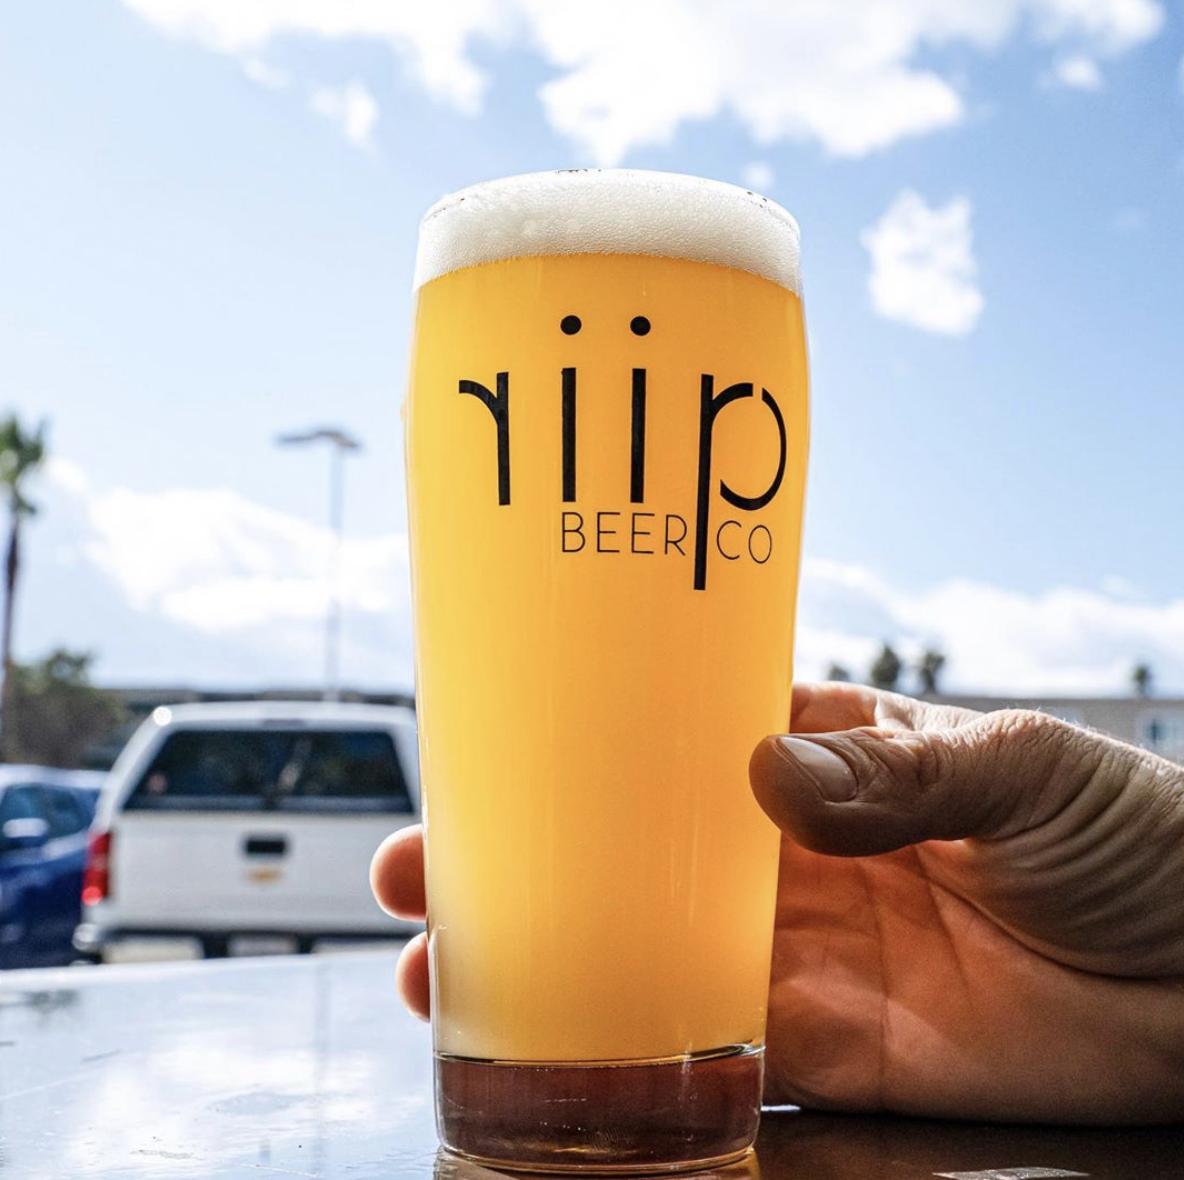 RIIP Beer Co in Huntington Beach